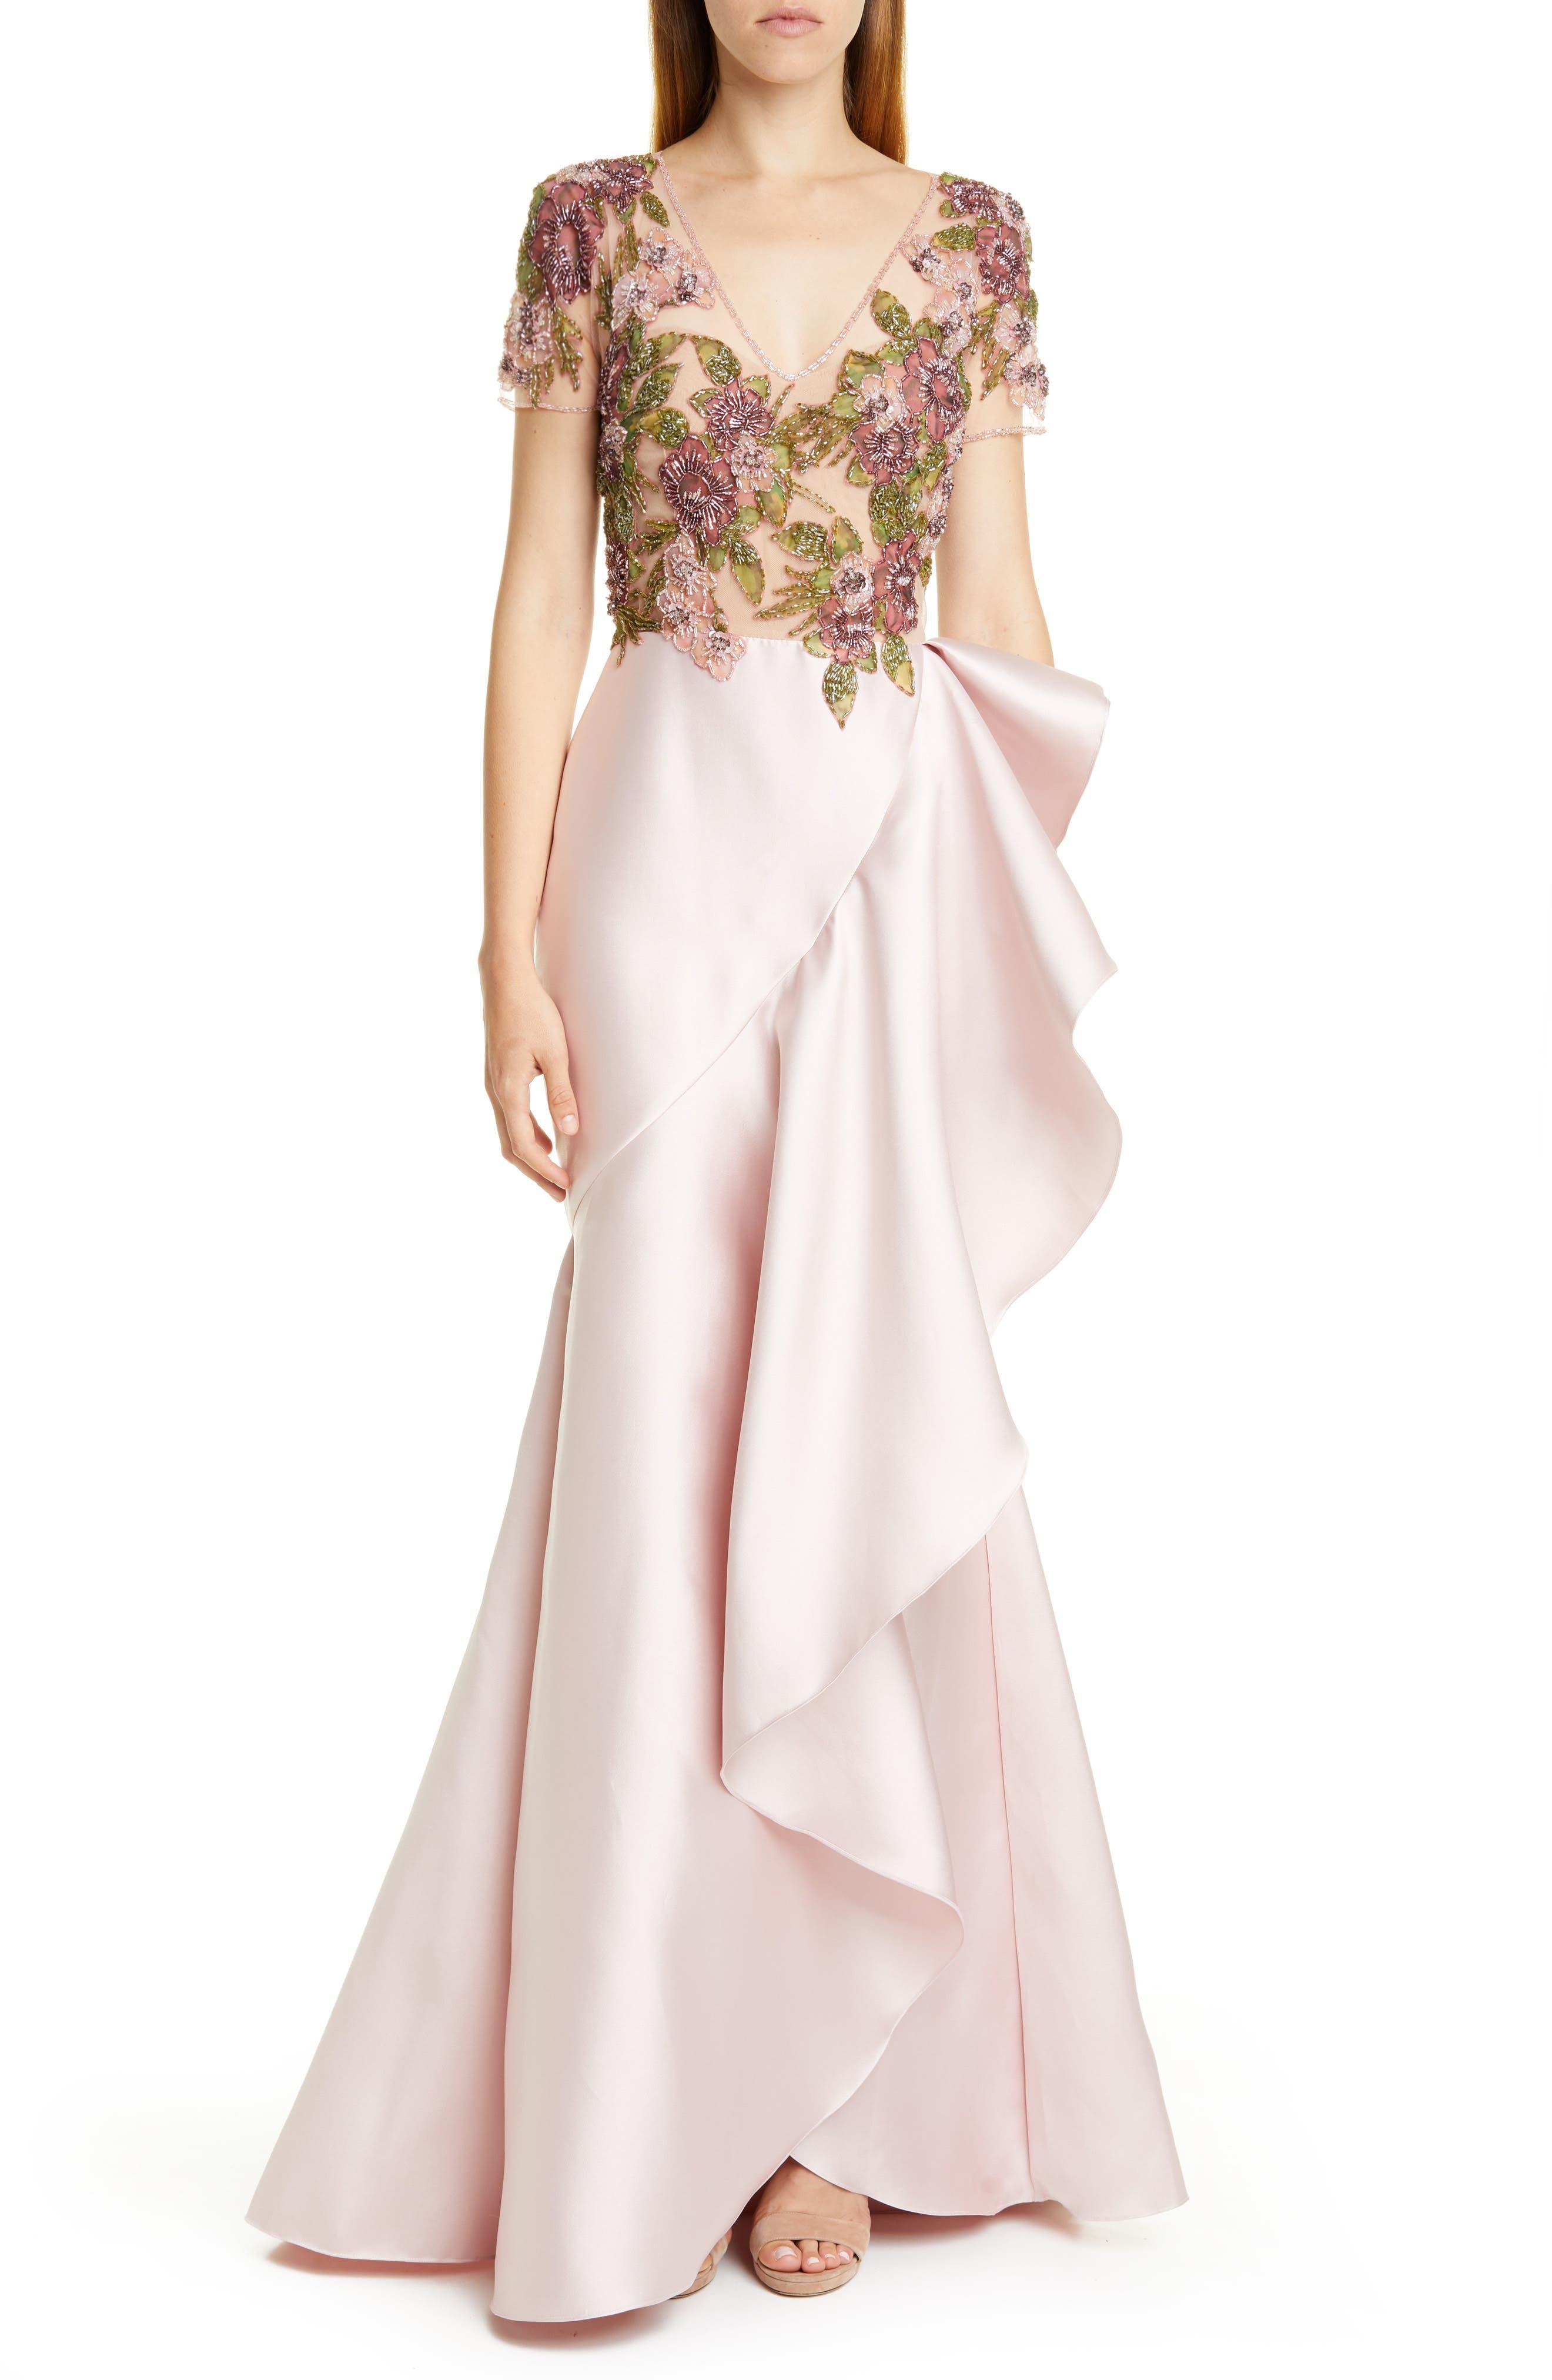 Patbo Beaded Ruffle Mermaid Gown, US / 40 BR - Pink